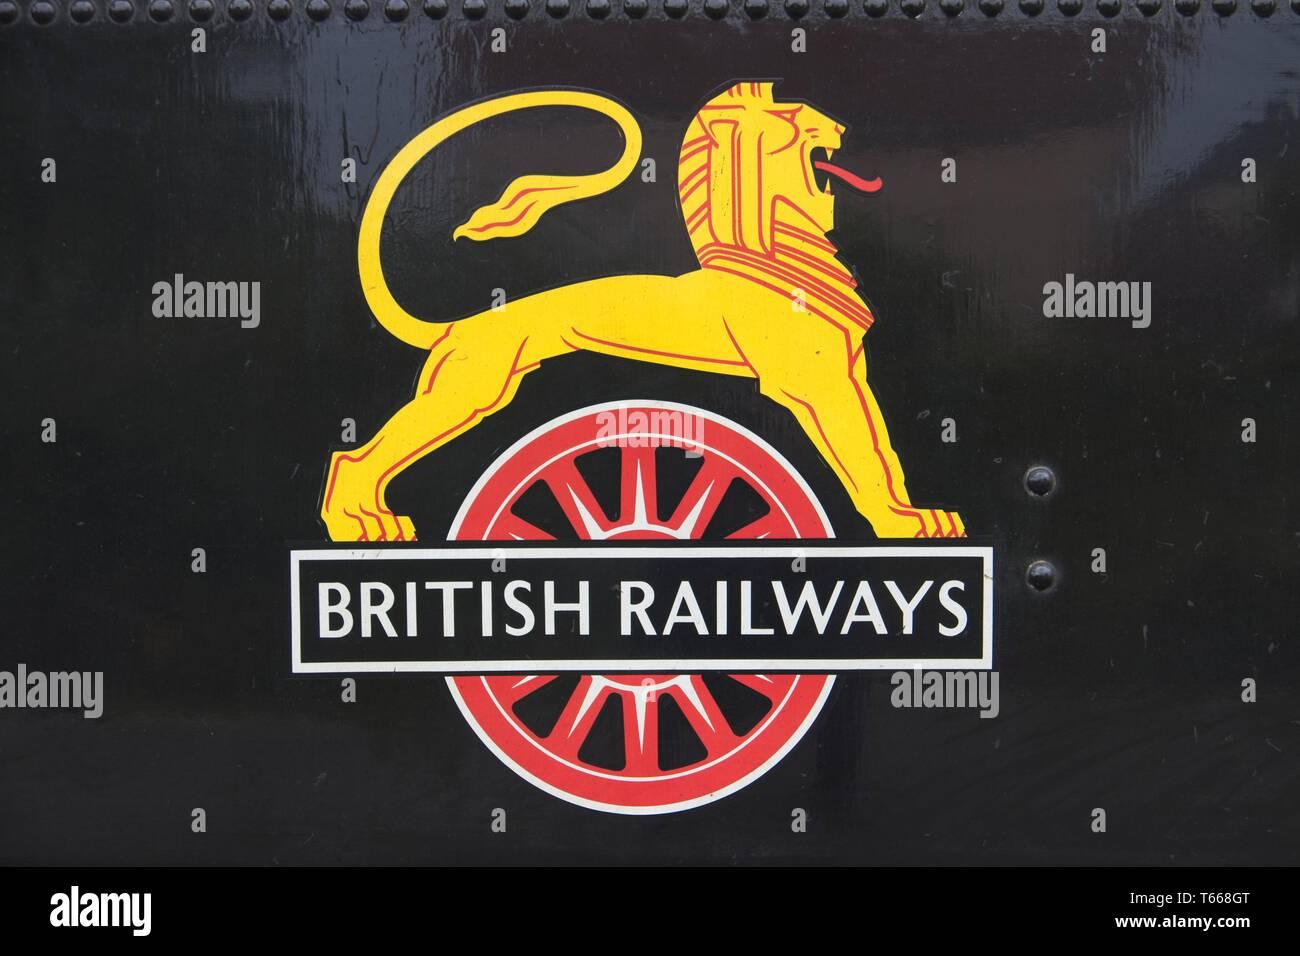 British Railways Logo - Stock Image